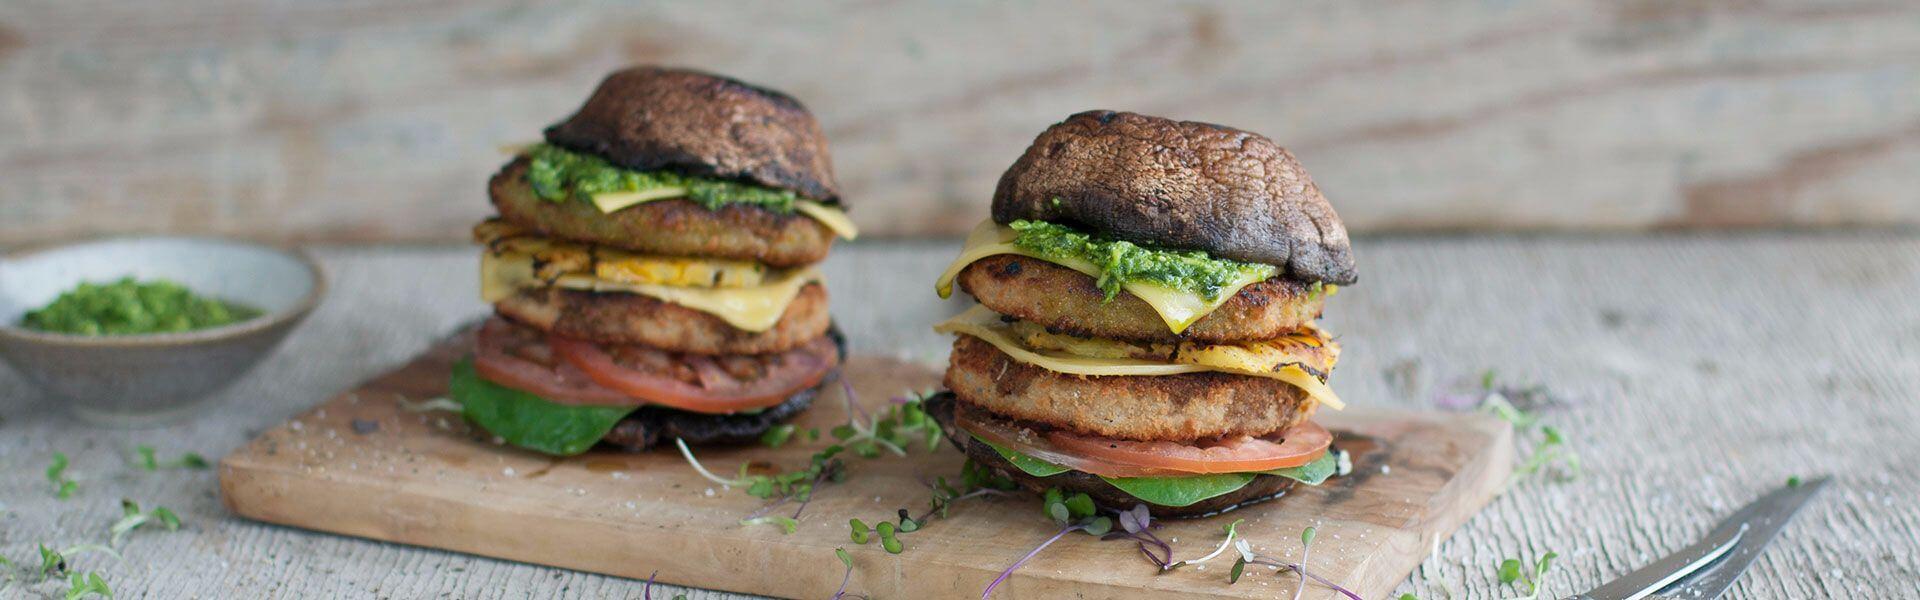 frys_pof_burger